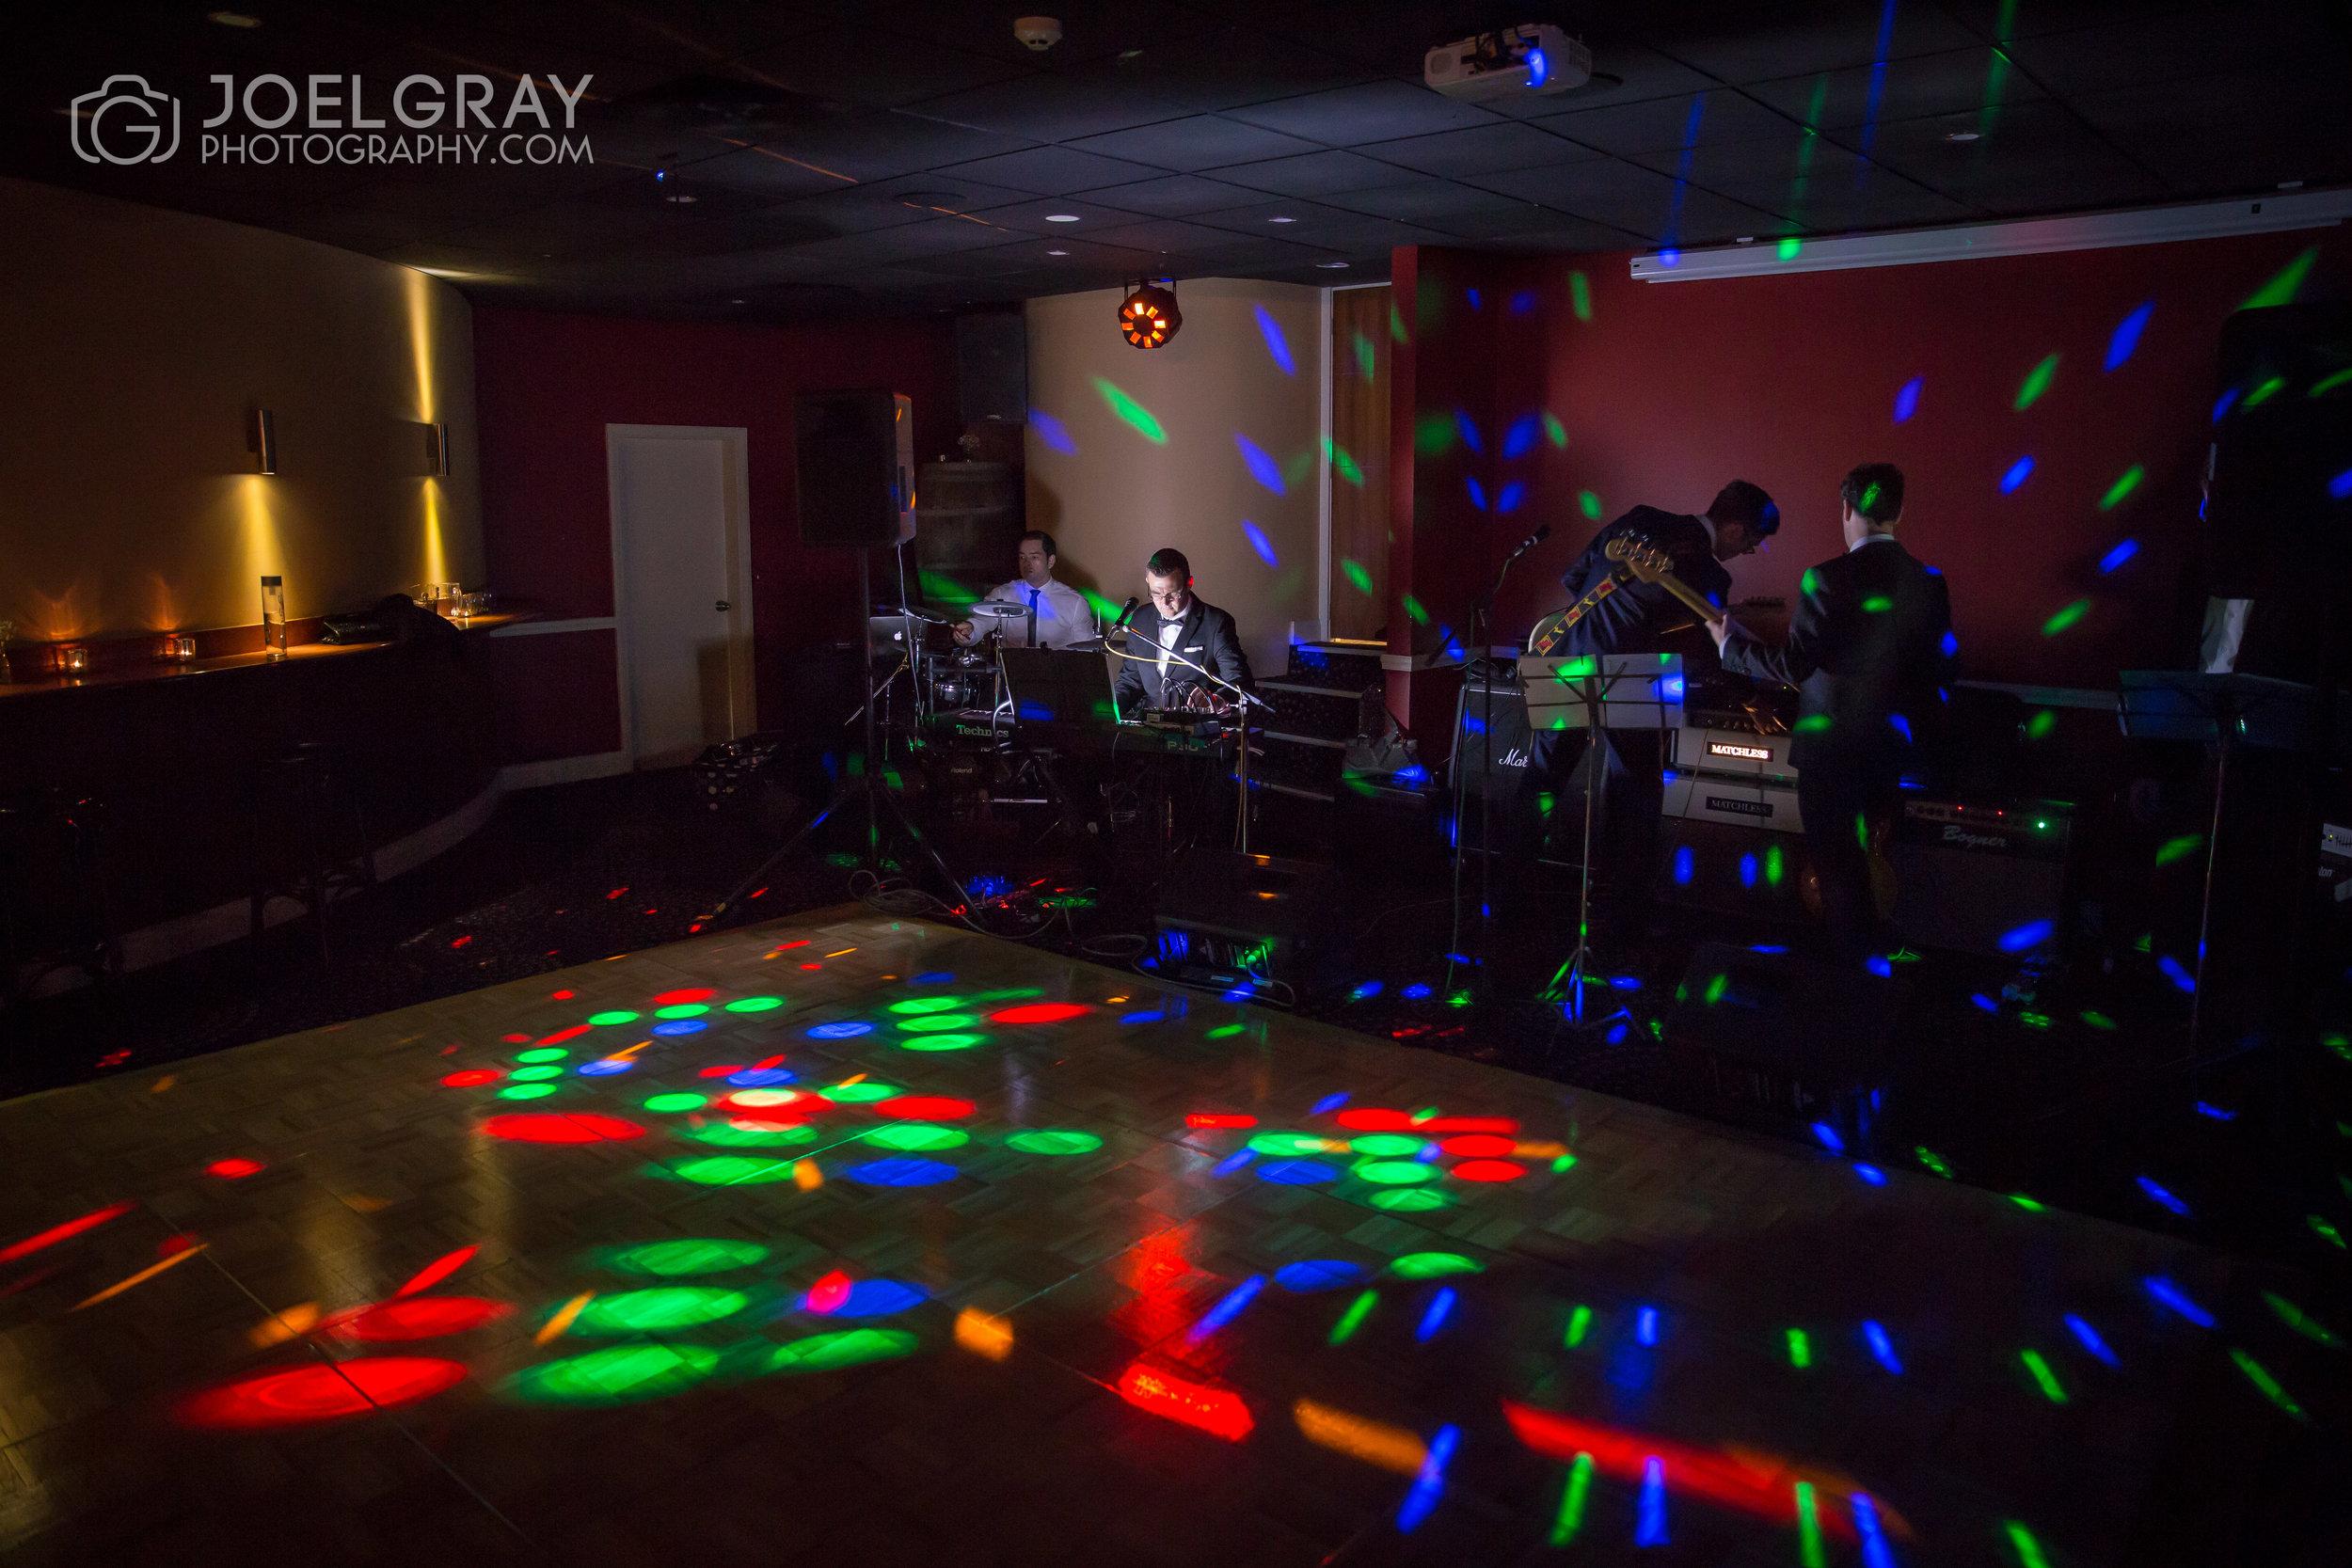 event-photography-live-music-photographer-sydney-1800829994